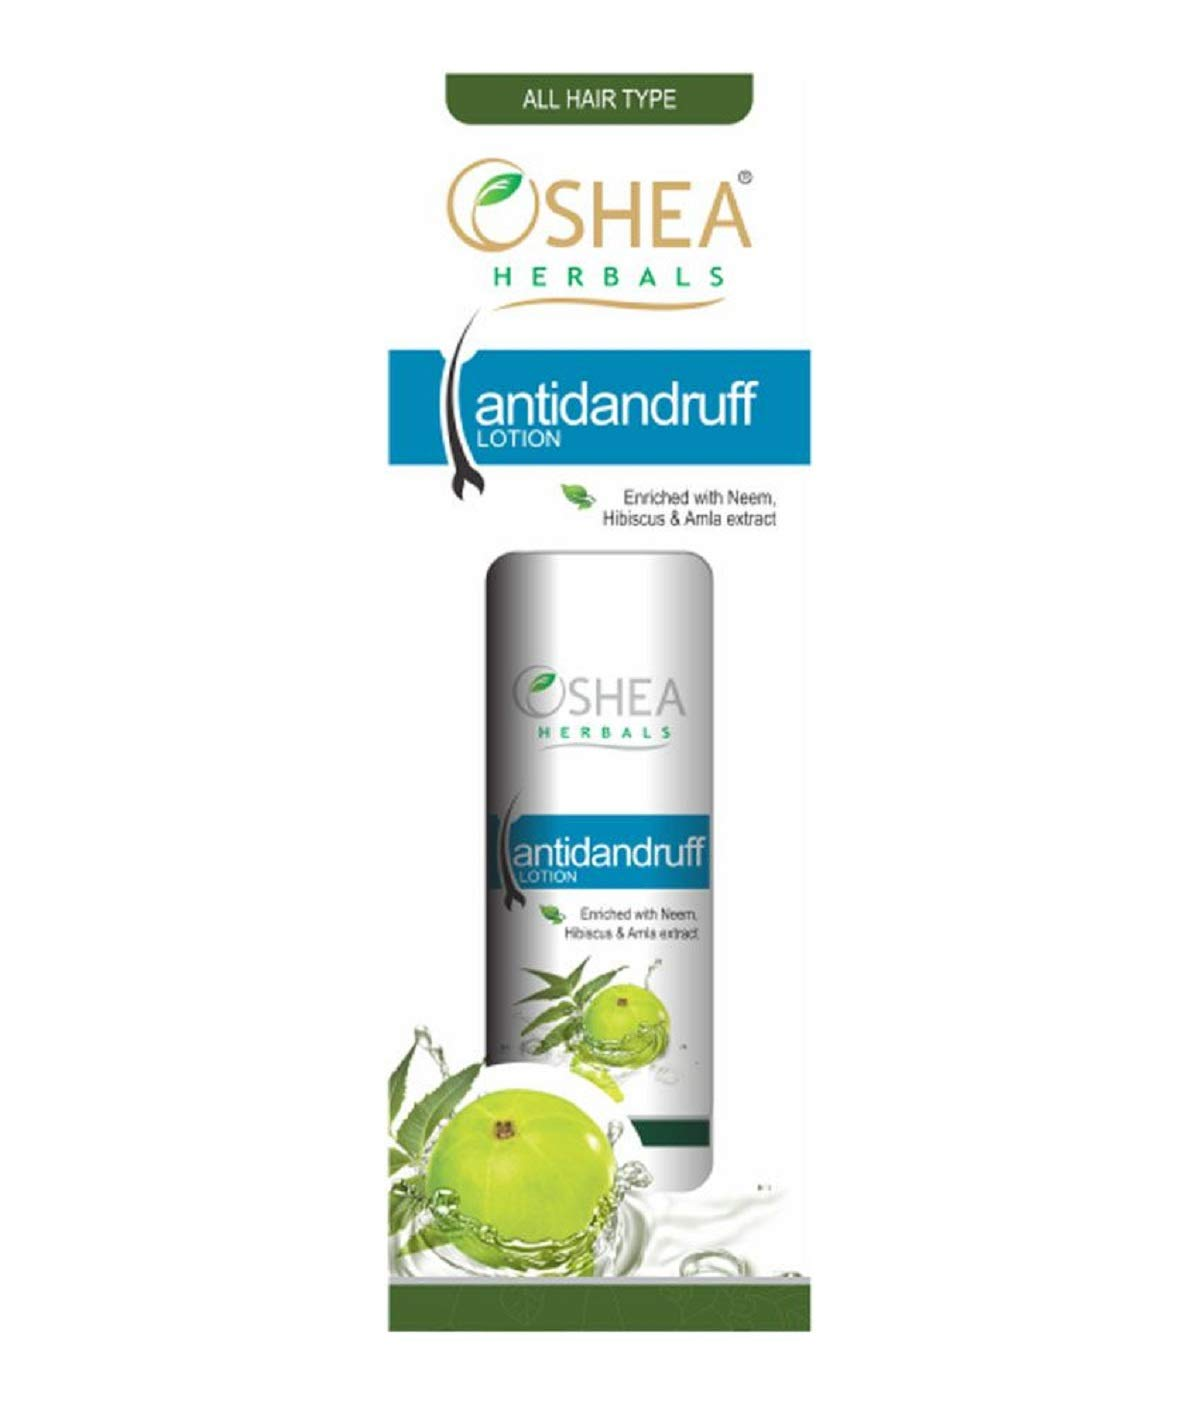 Oshea Herbals Anti Dandruff Lotion (50ml) by OSHEA